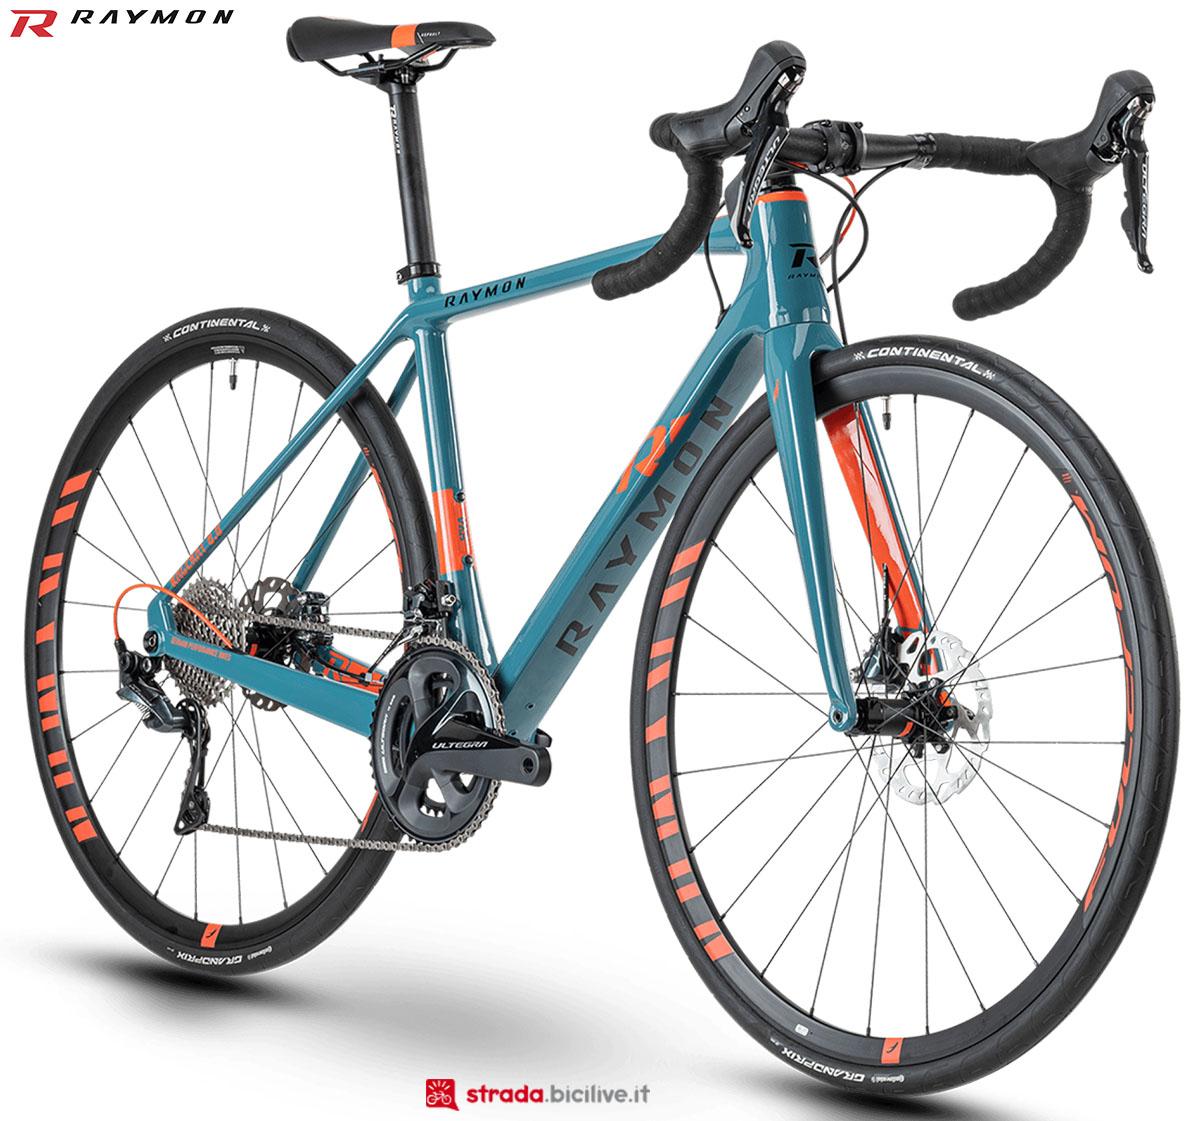 La bici R Raymon RACERAY 8.0 2020